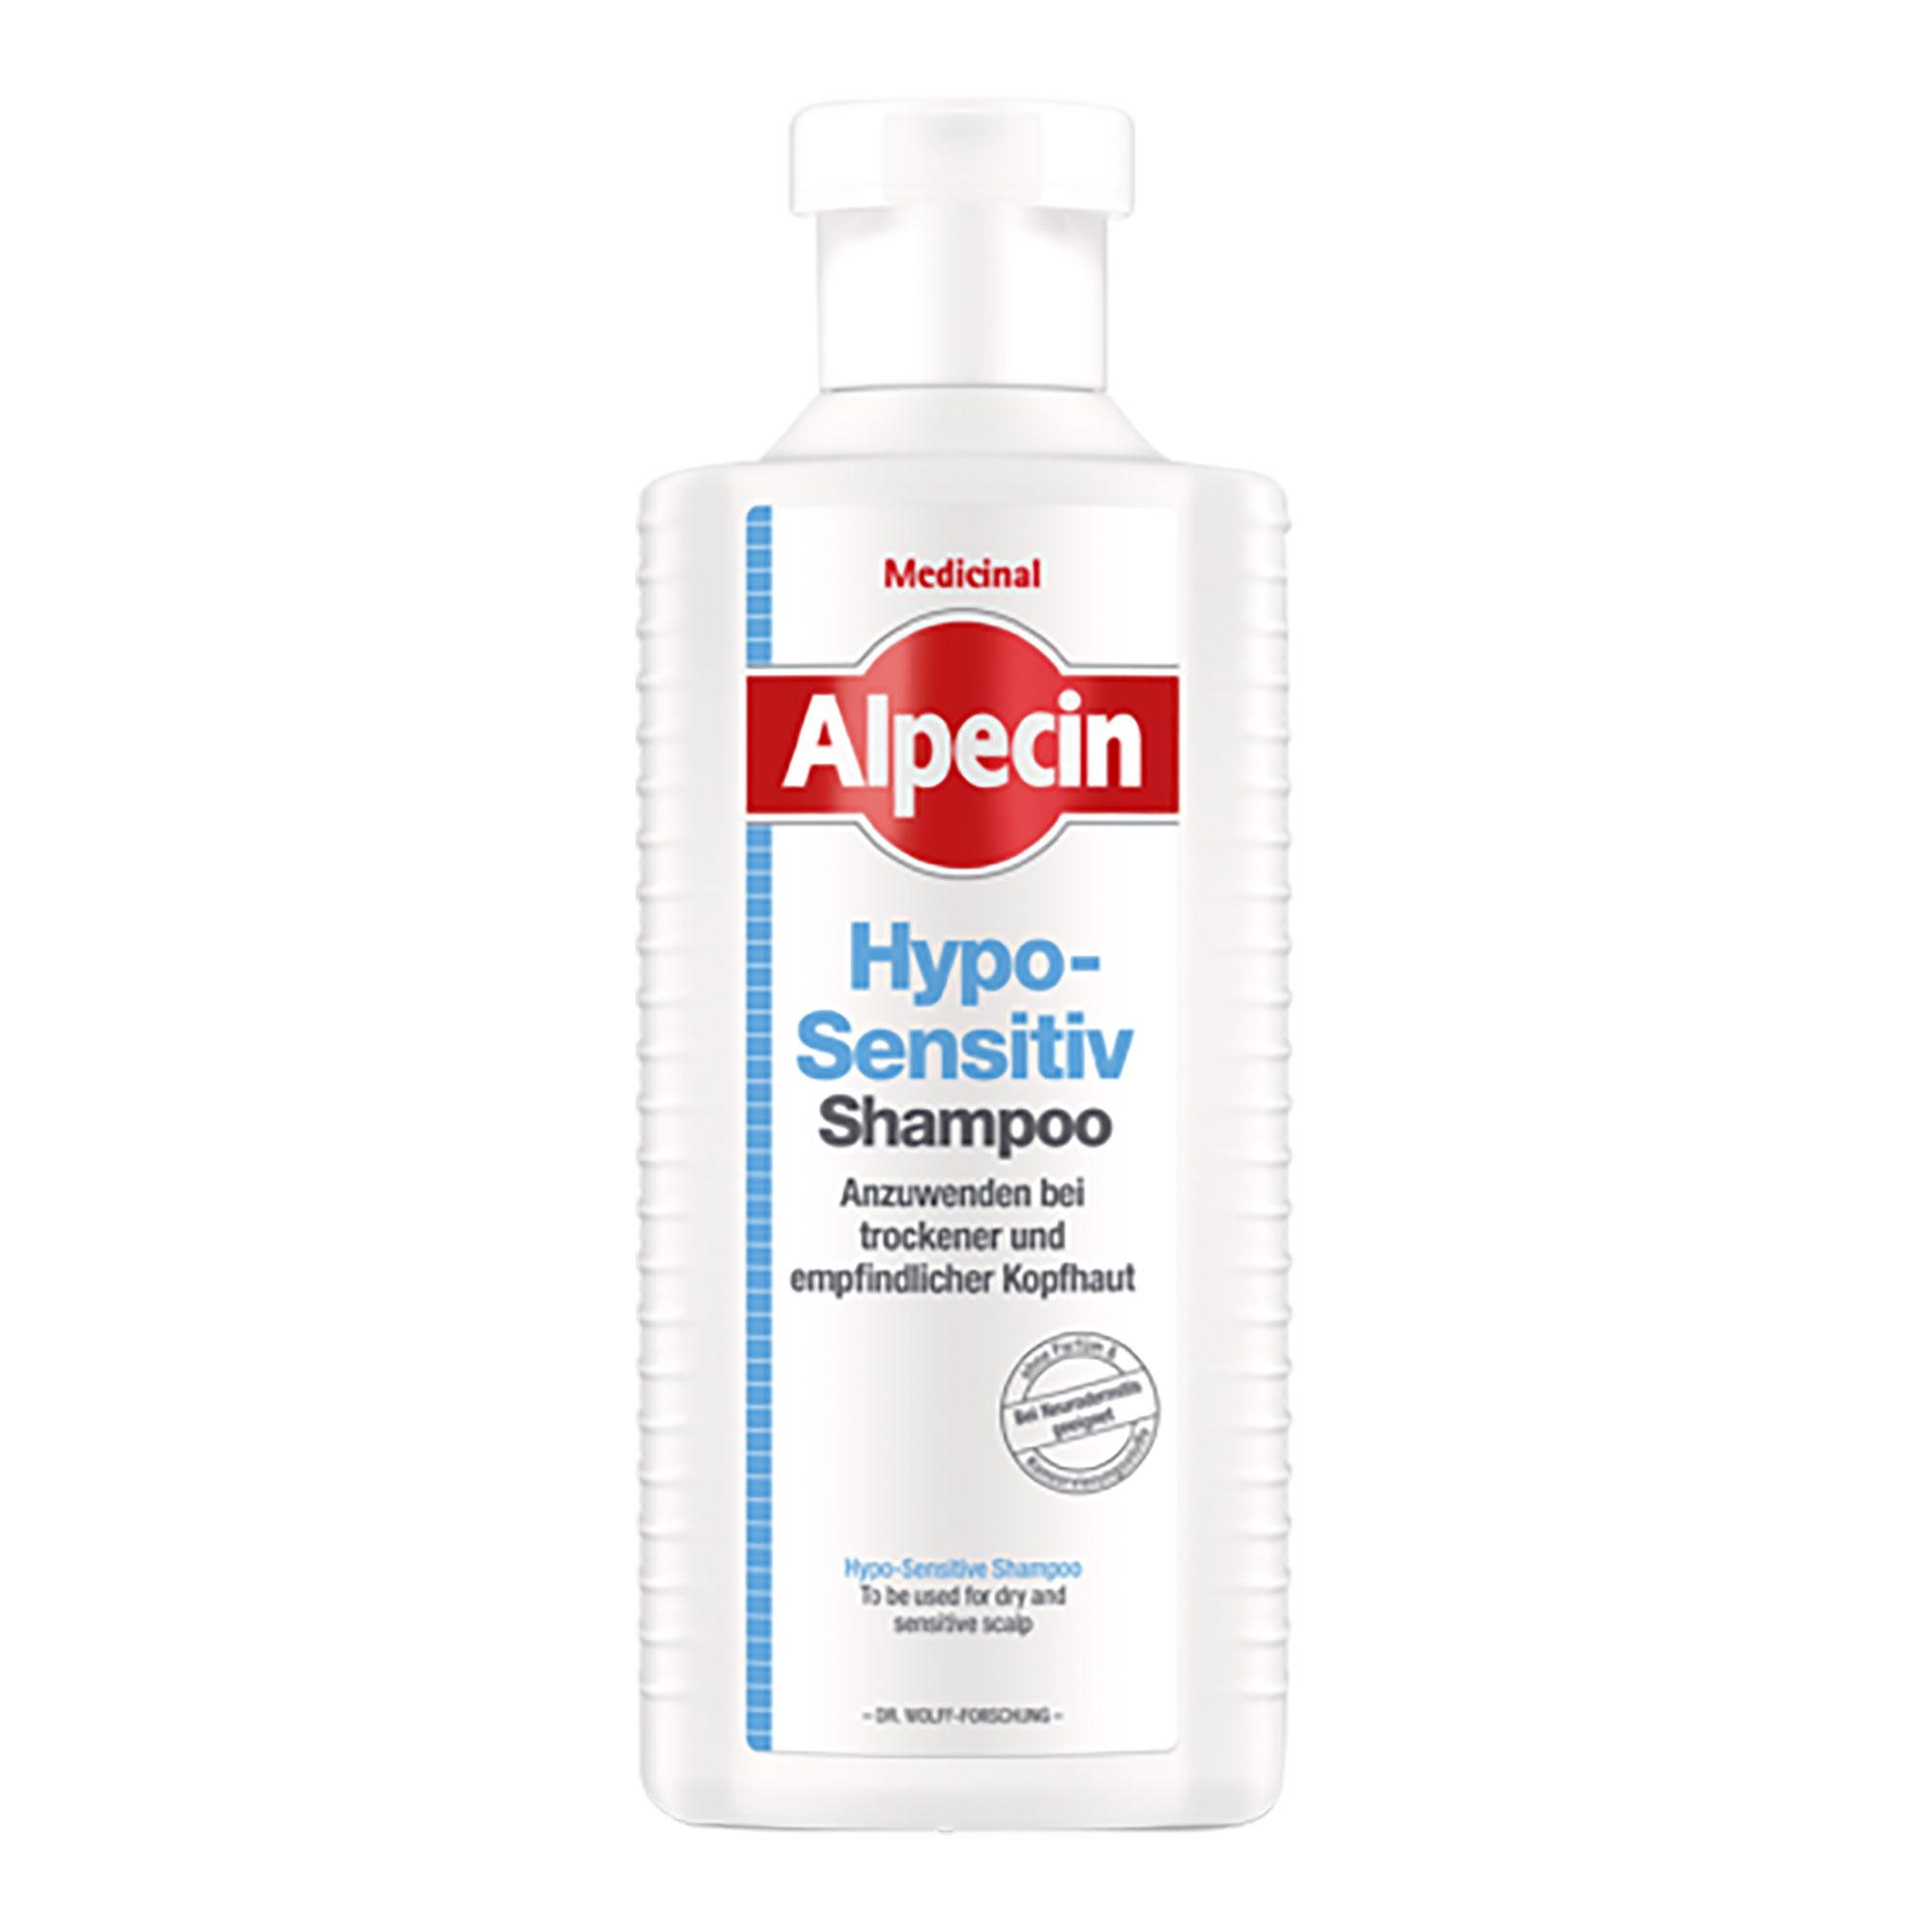 Alpecin Hypo Sensitiv Shampoo